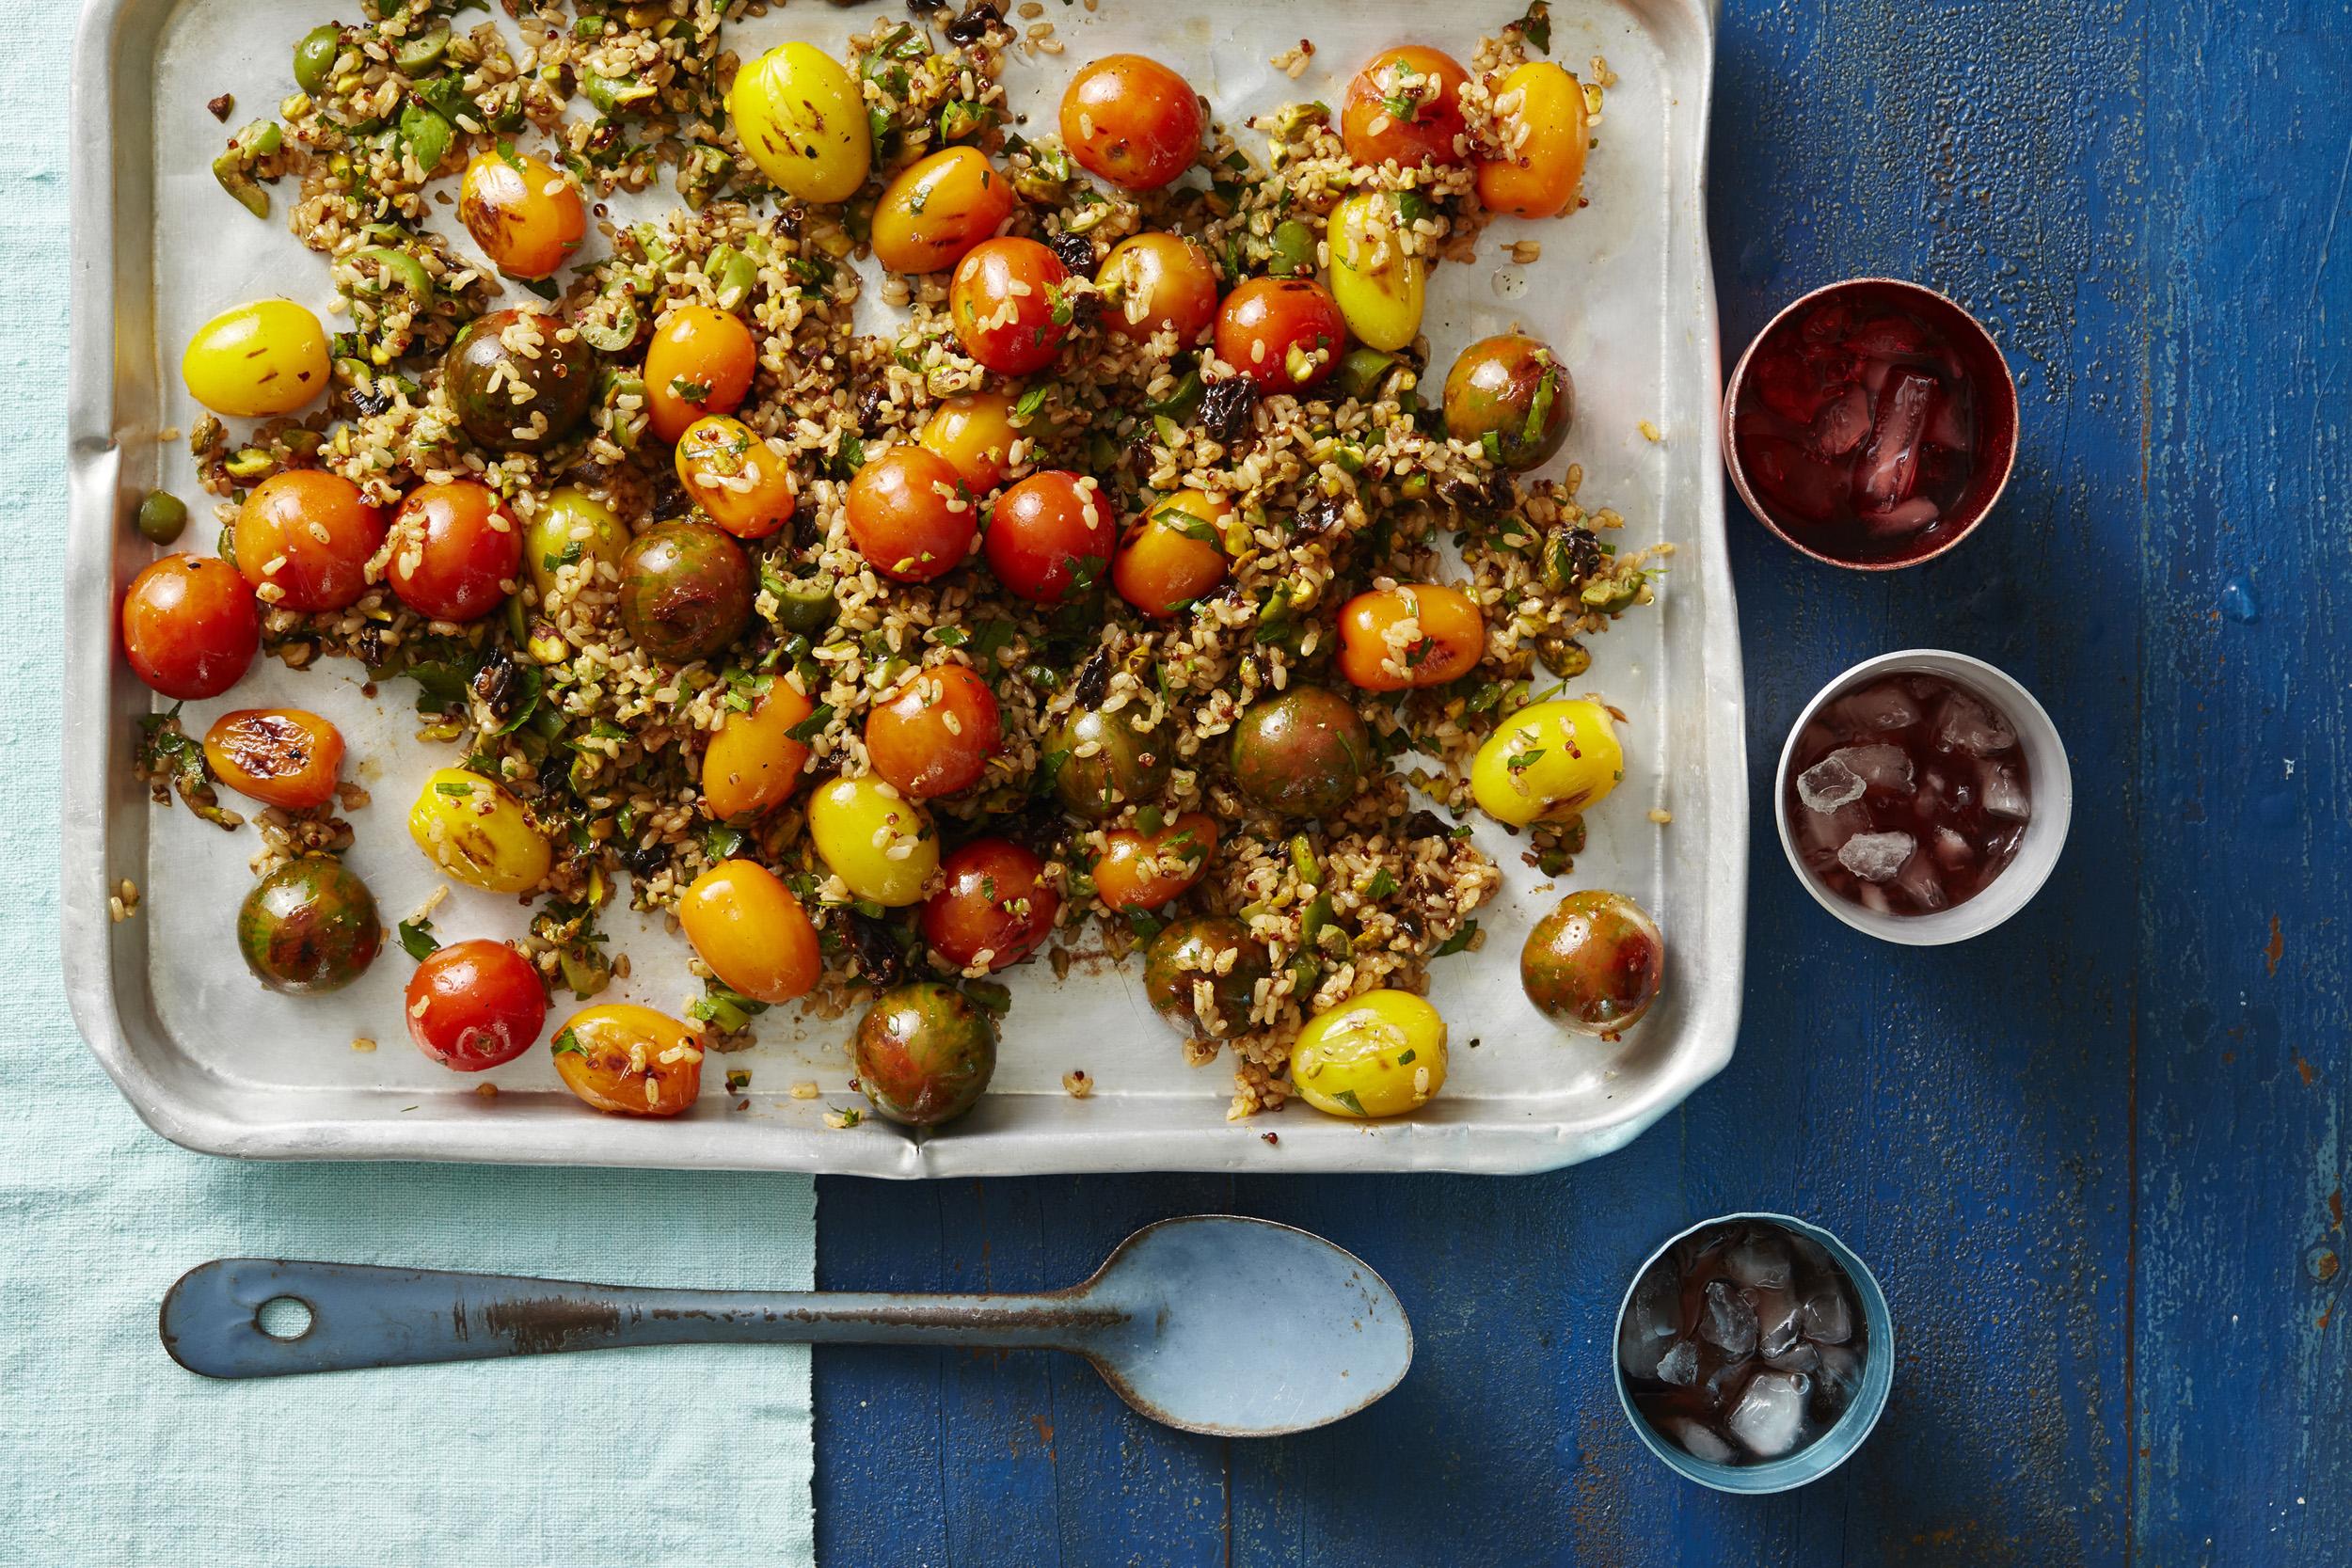 Recipe_LR_Medley_Tomatoes_Pistachio Rice & Quinoa Salad_Janelle Bloom_2015_11